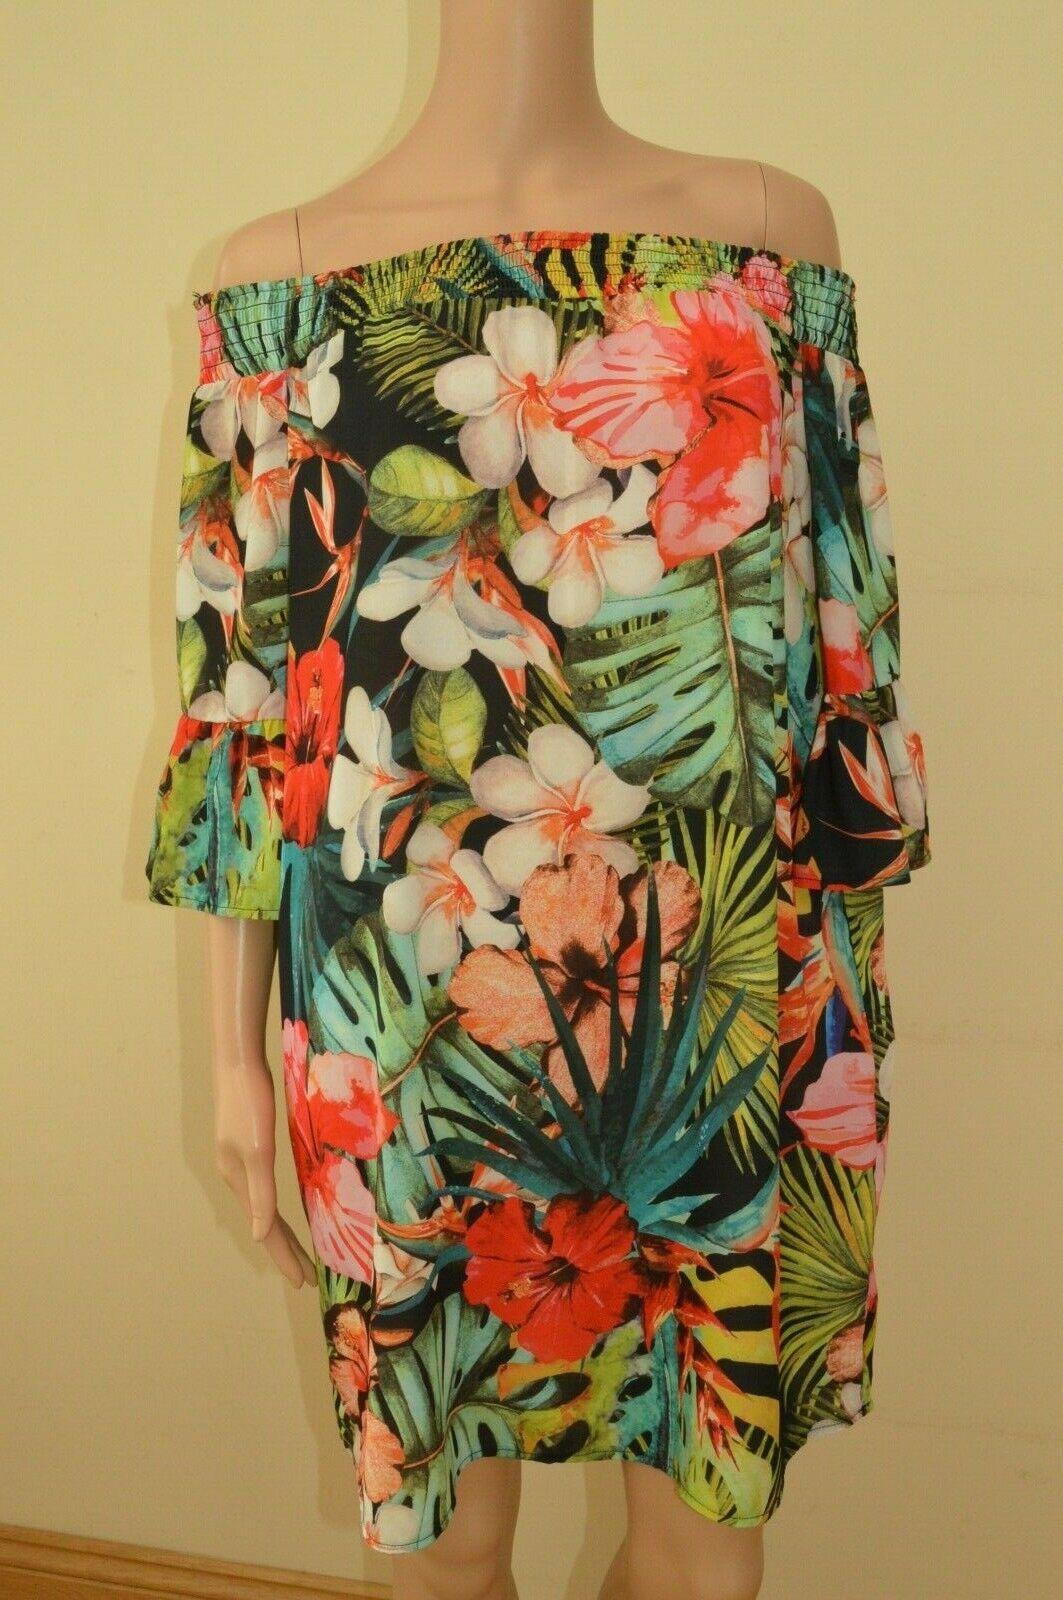 New Lipsy Floral Tropical Multicolourot Bardot Dress Dress Dress Sz UK 14 | Genial Und Praktisch  | Genial Und Praktisch  | Garantiere Qualität und Quantität  9fbbdc